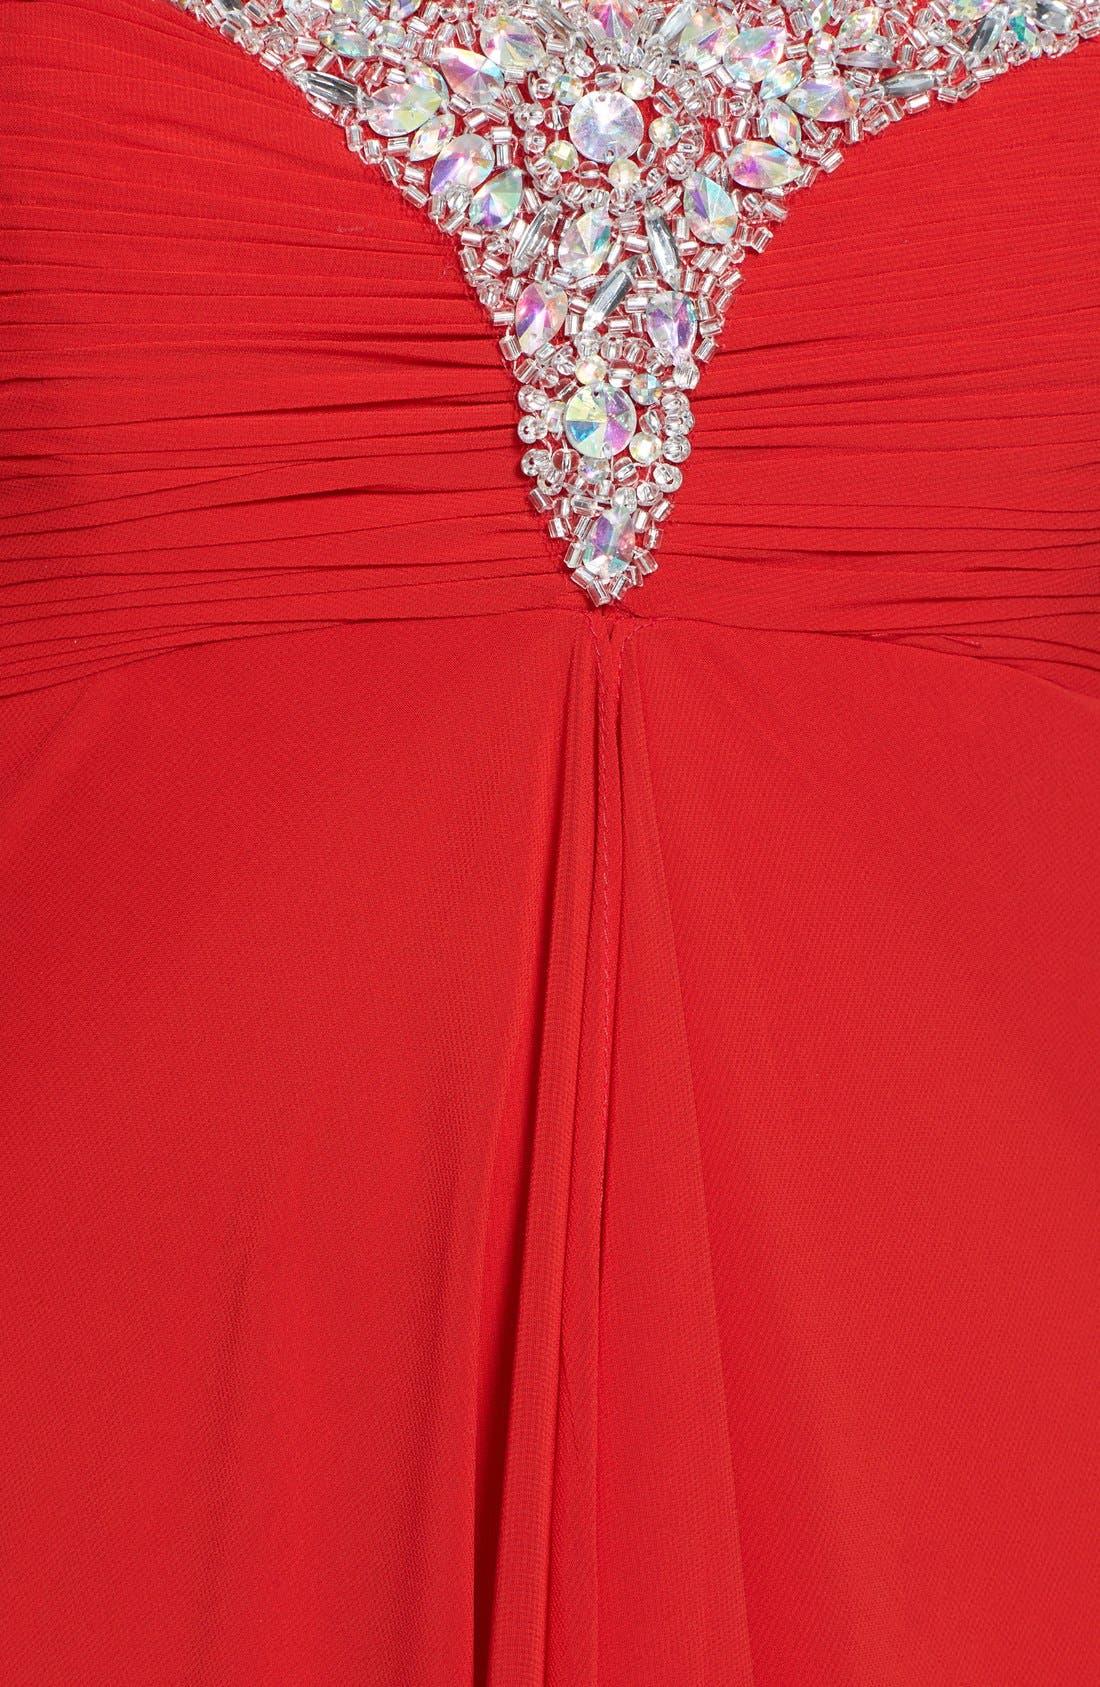 Alternate Image 3  - Faviana Jeweled Layered Chiffon Gown (Online Exclusive)